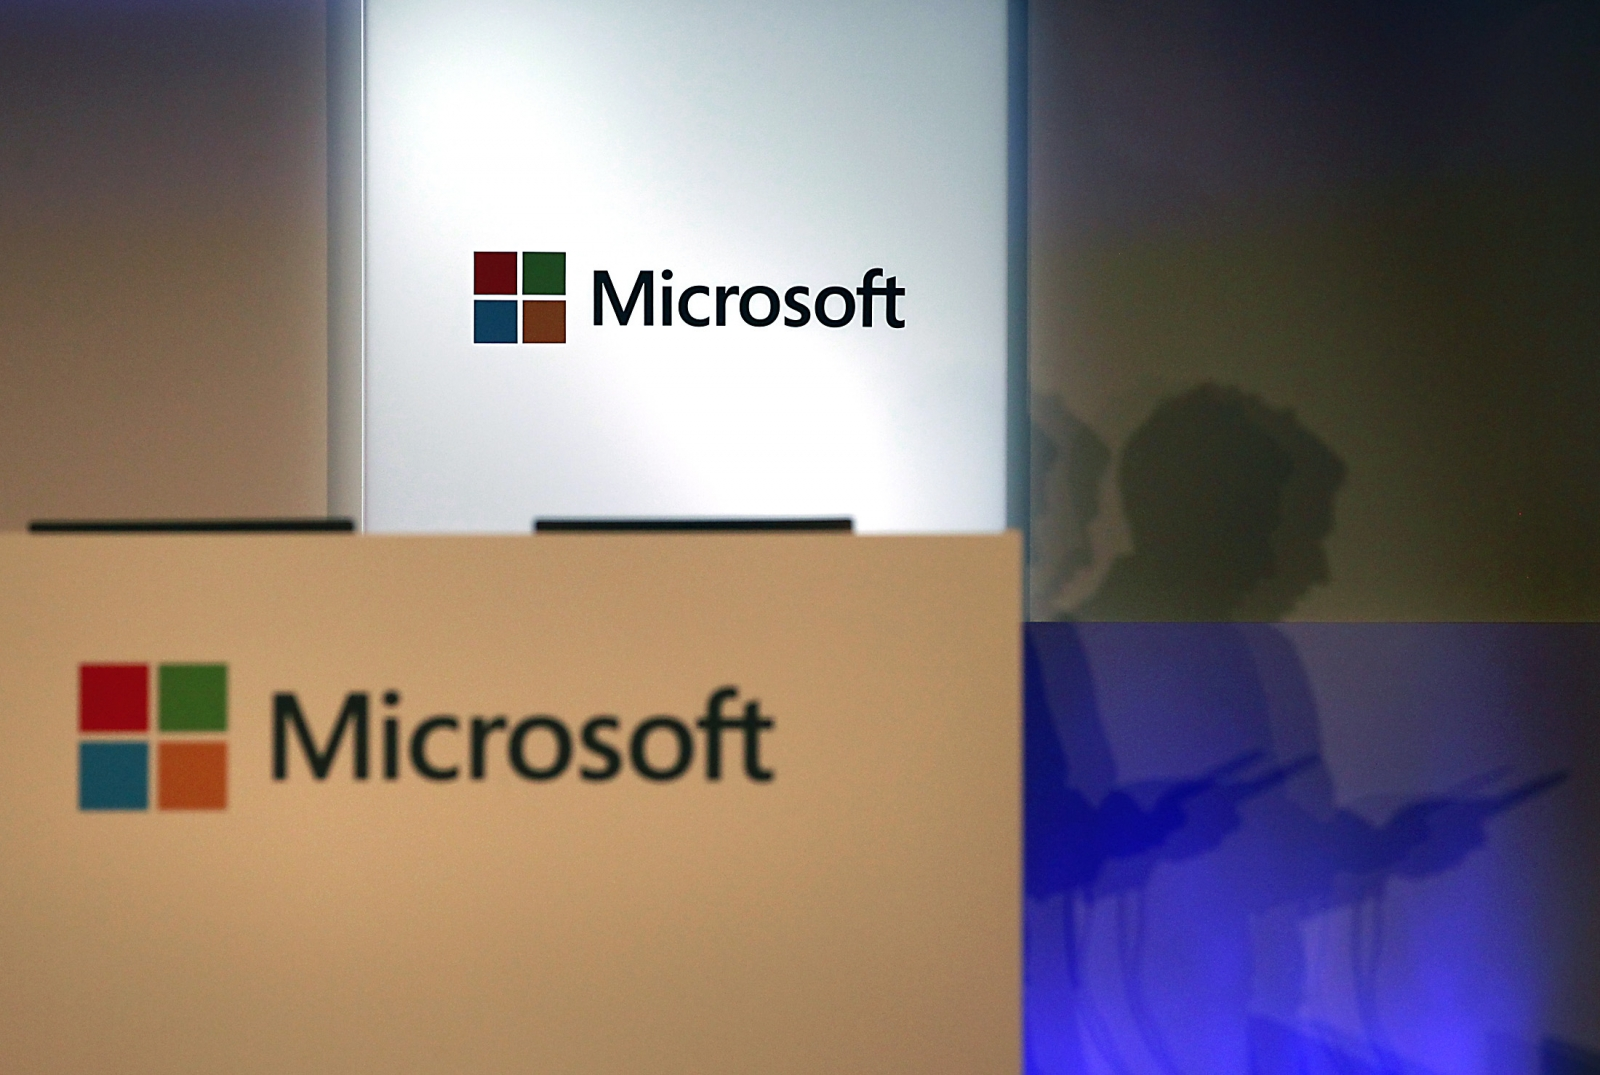 Windows 9 Livestream: Where to Watch